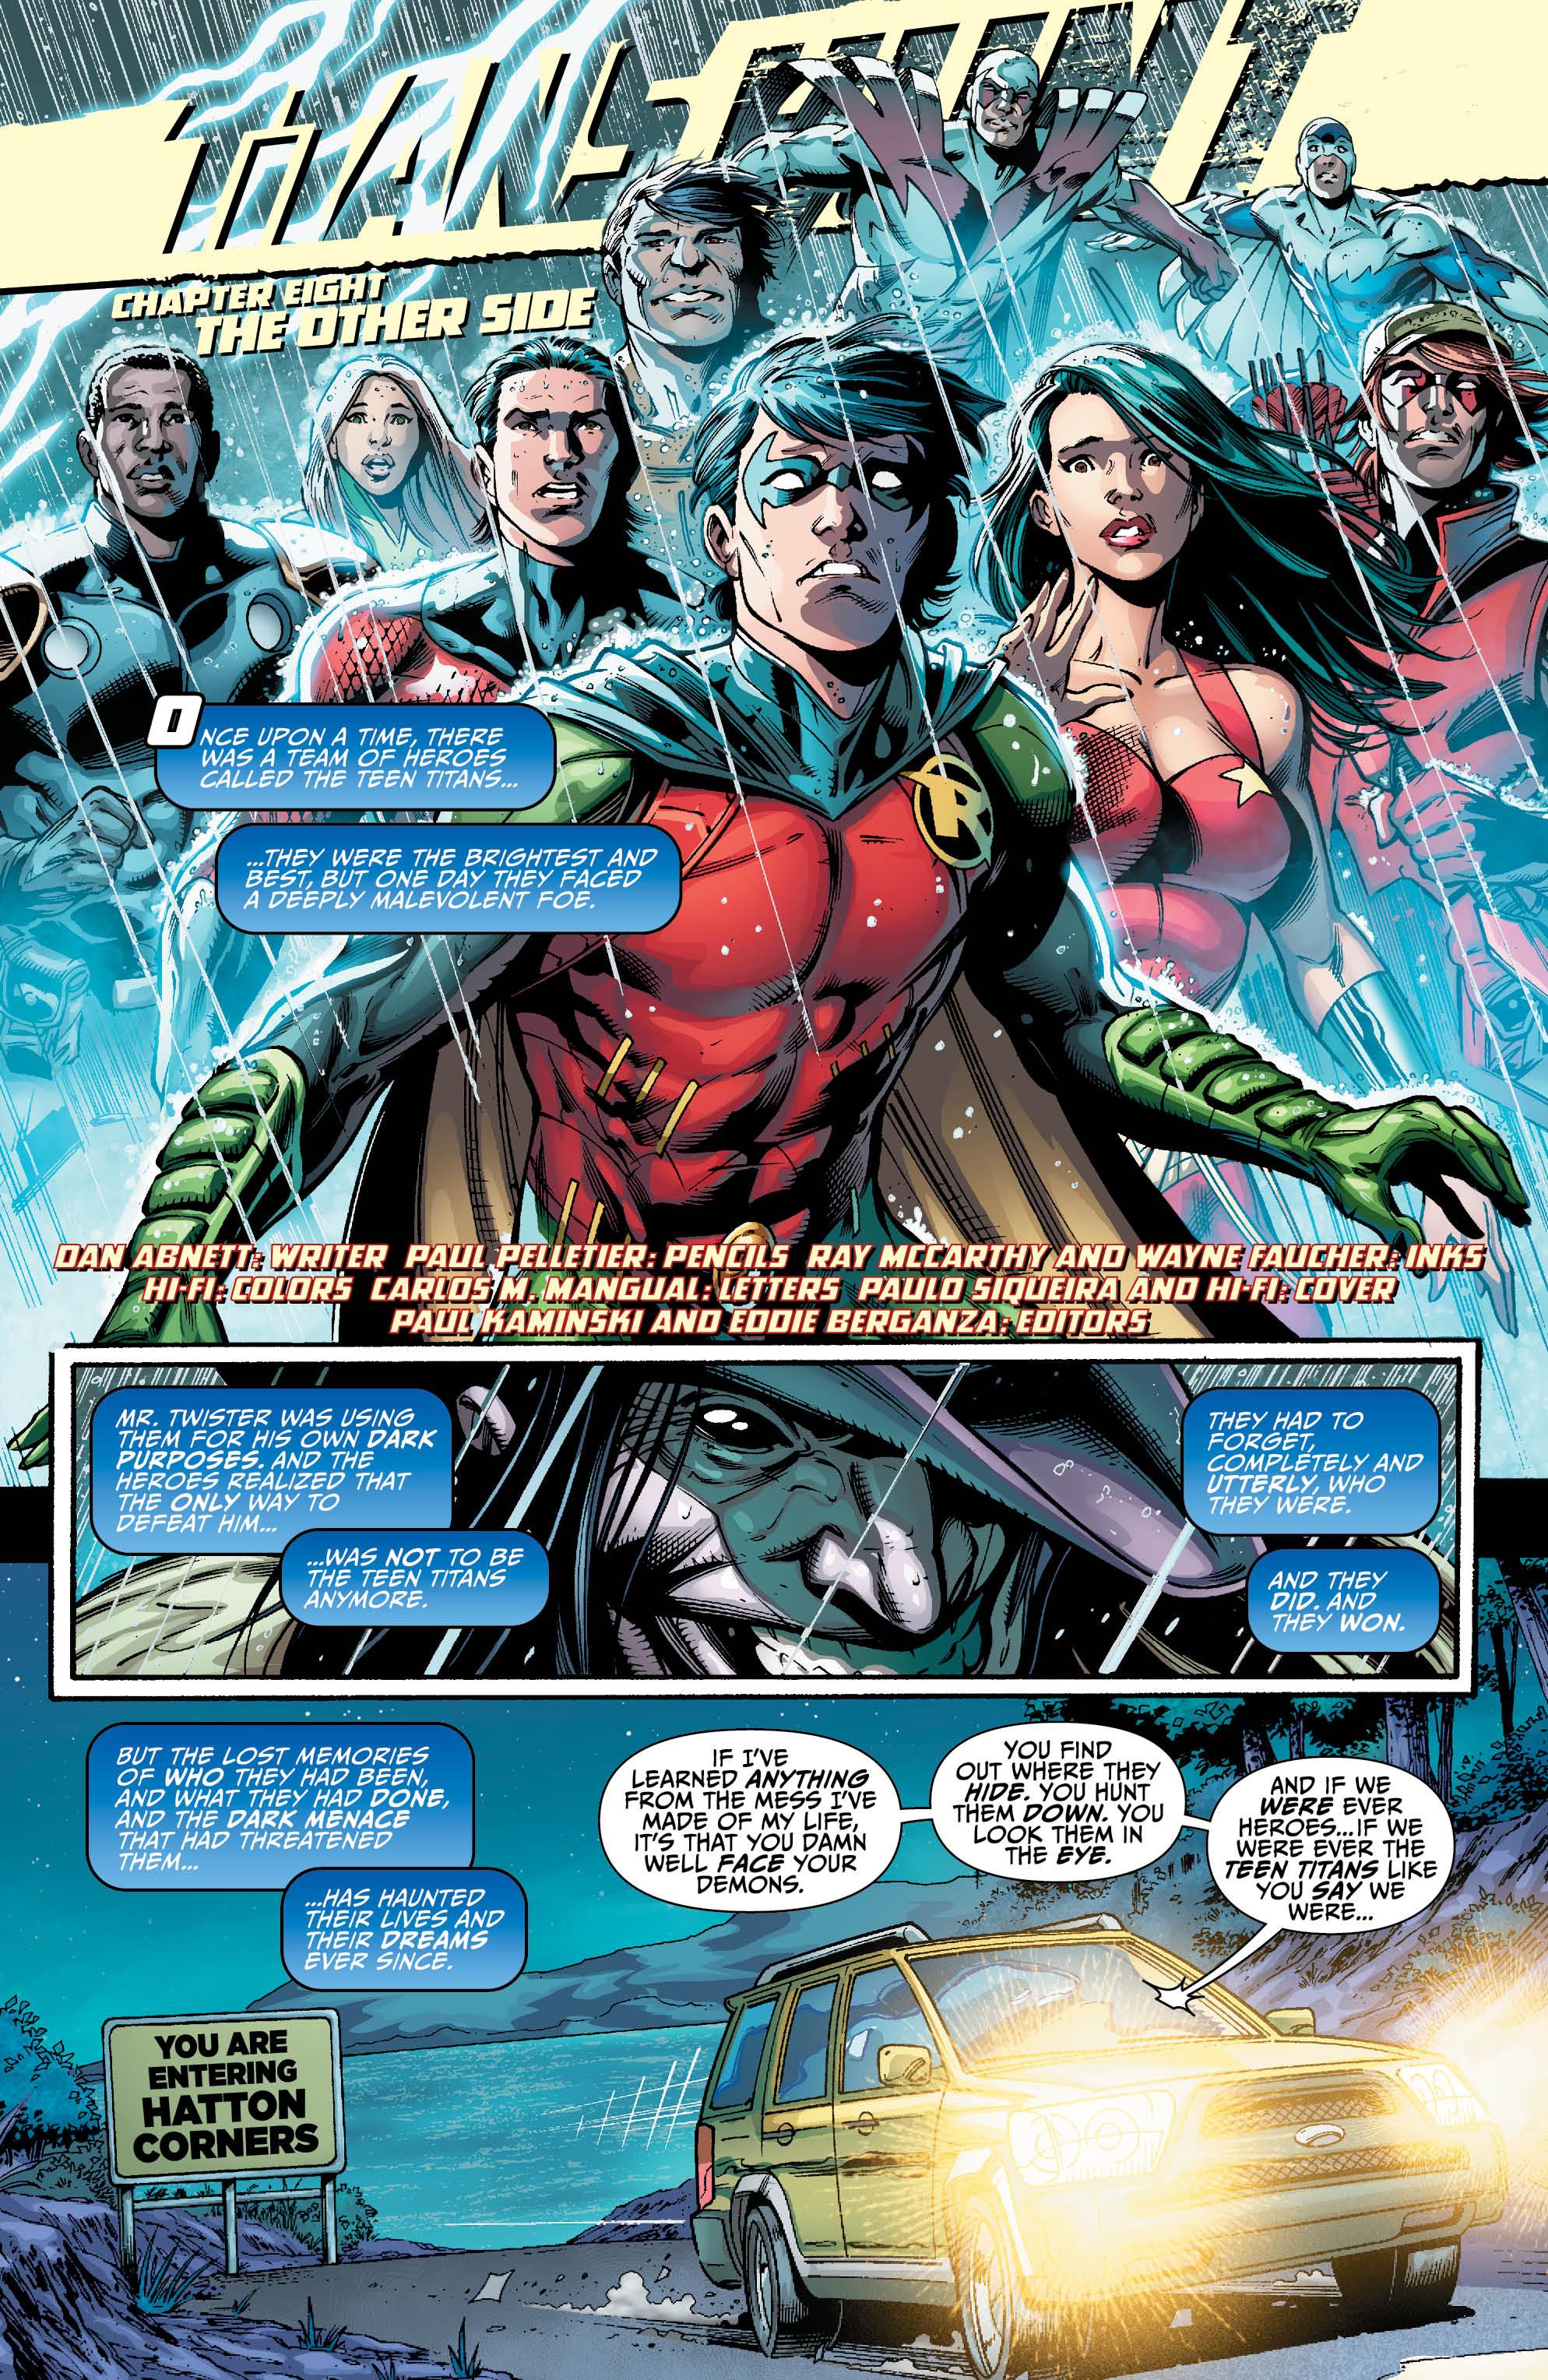 TITANS HUNT #8 page 1